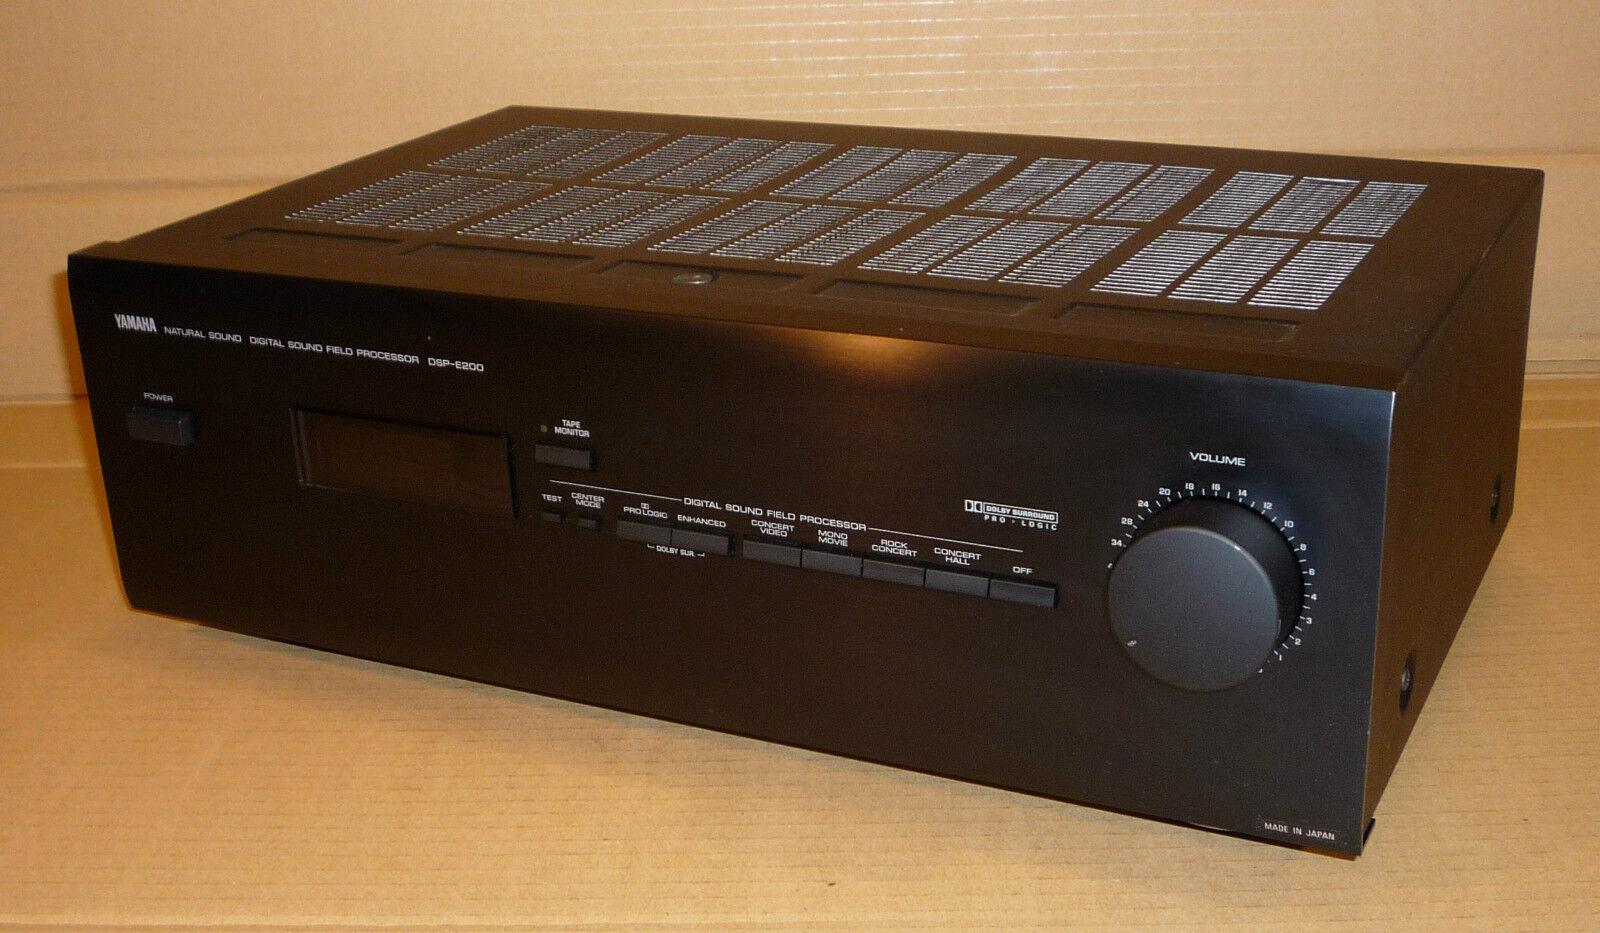 Ebay YAMAHA DOLBY PRO-LOGIC SURROUND SOUND DSP-E200 AV AMPLIFIER AMP CINEMA